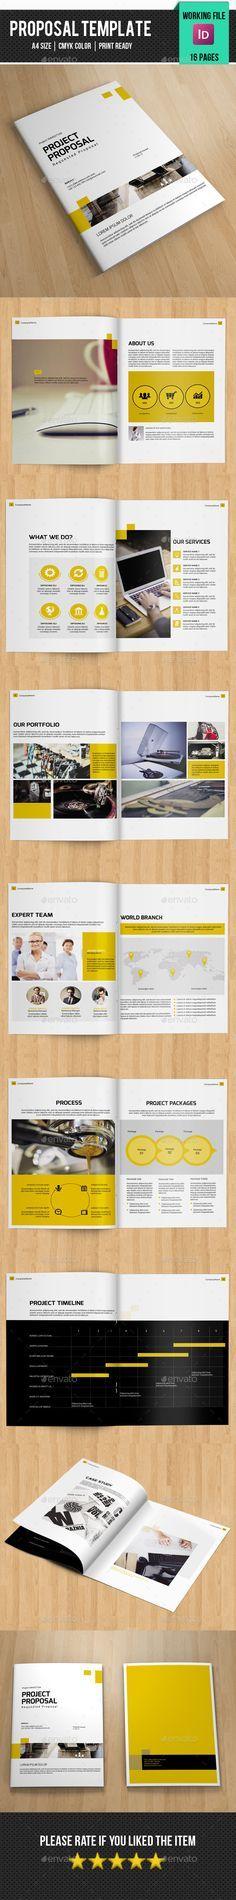 Top 25+ best Business proposal ideas ideas on Pinterest Business - business project proposal template